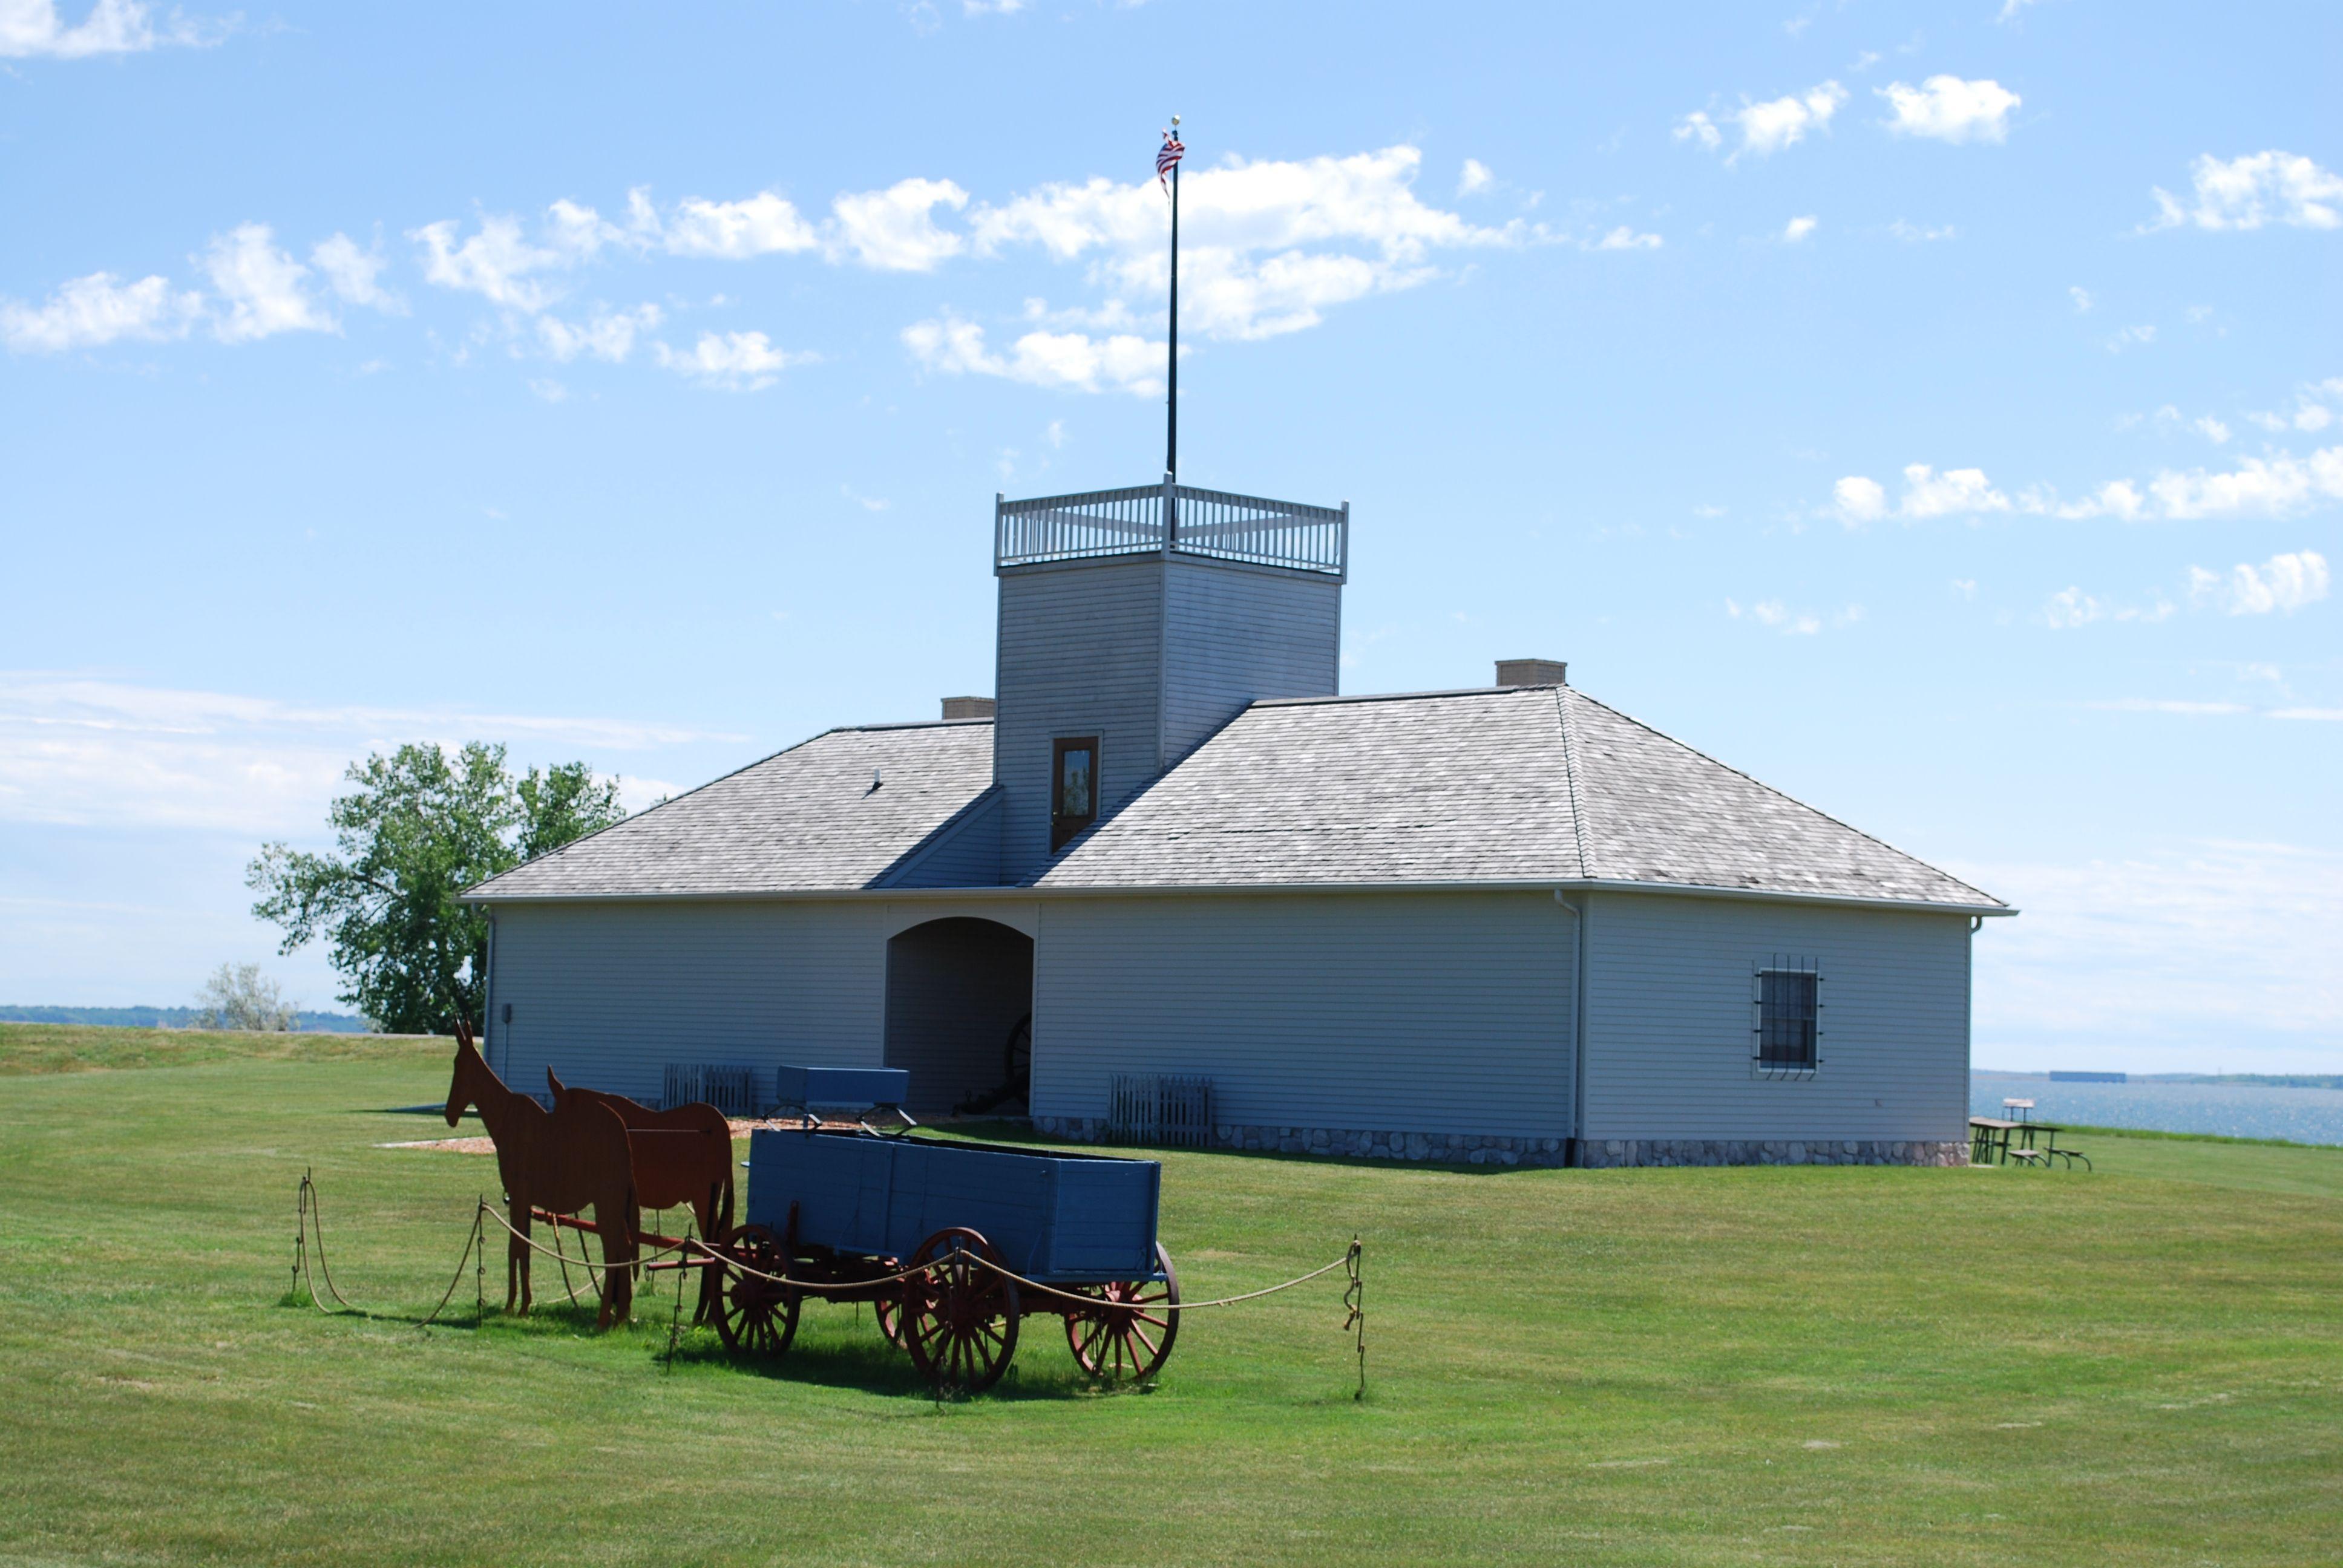 interior design ndsu - 1000+ images about North Dakota, US on Pinterest Fargo north ...